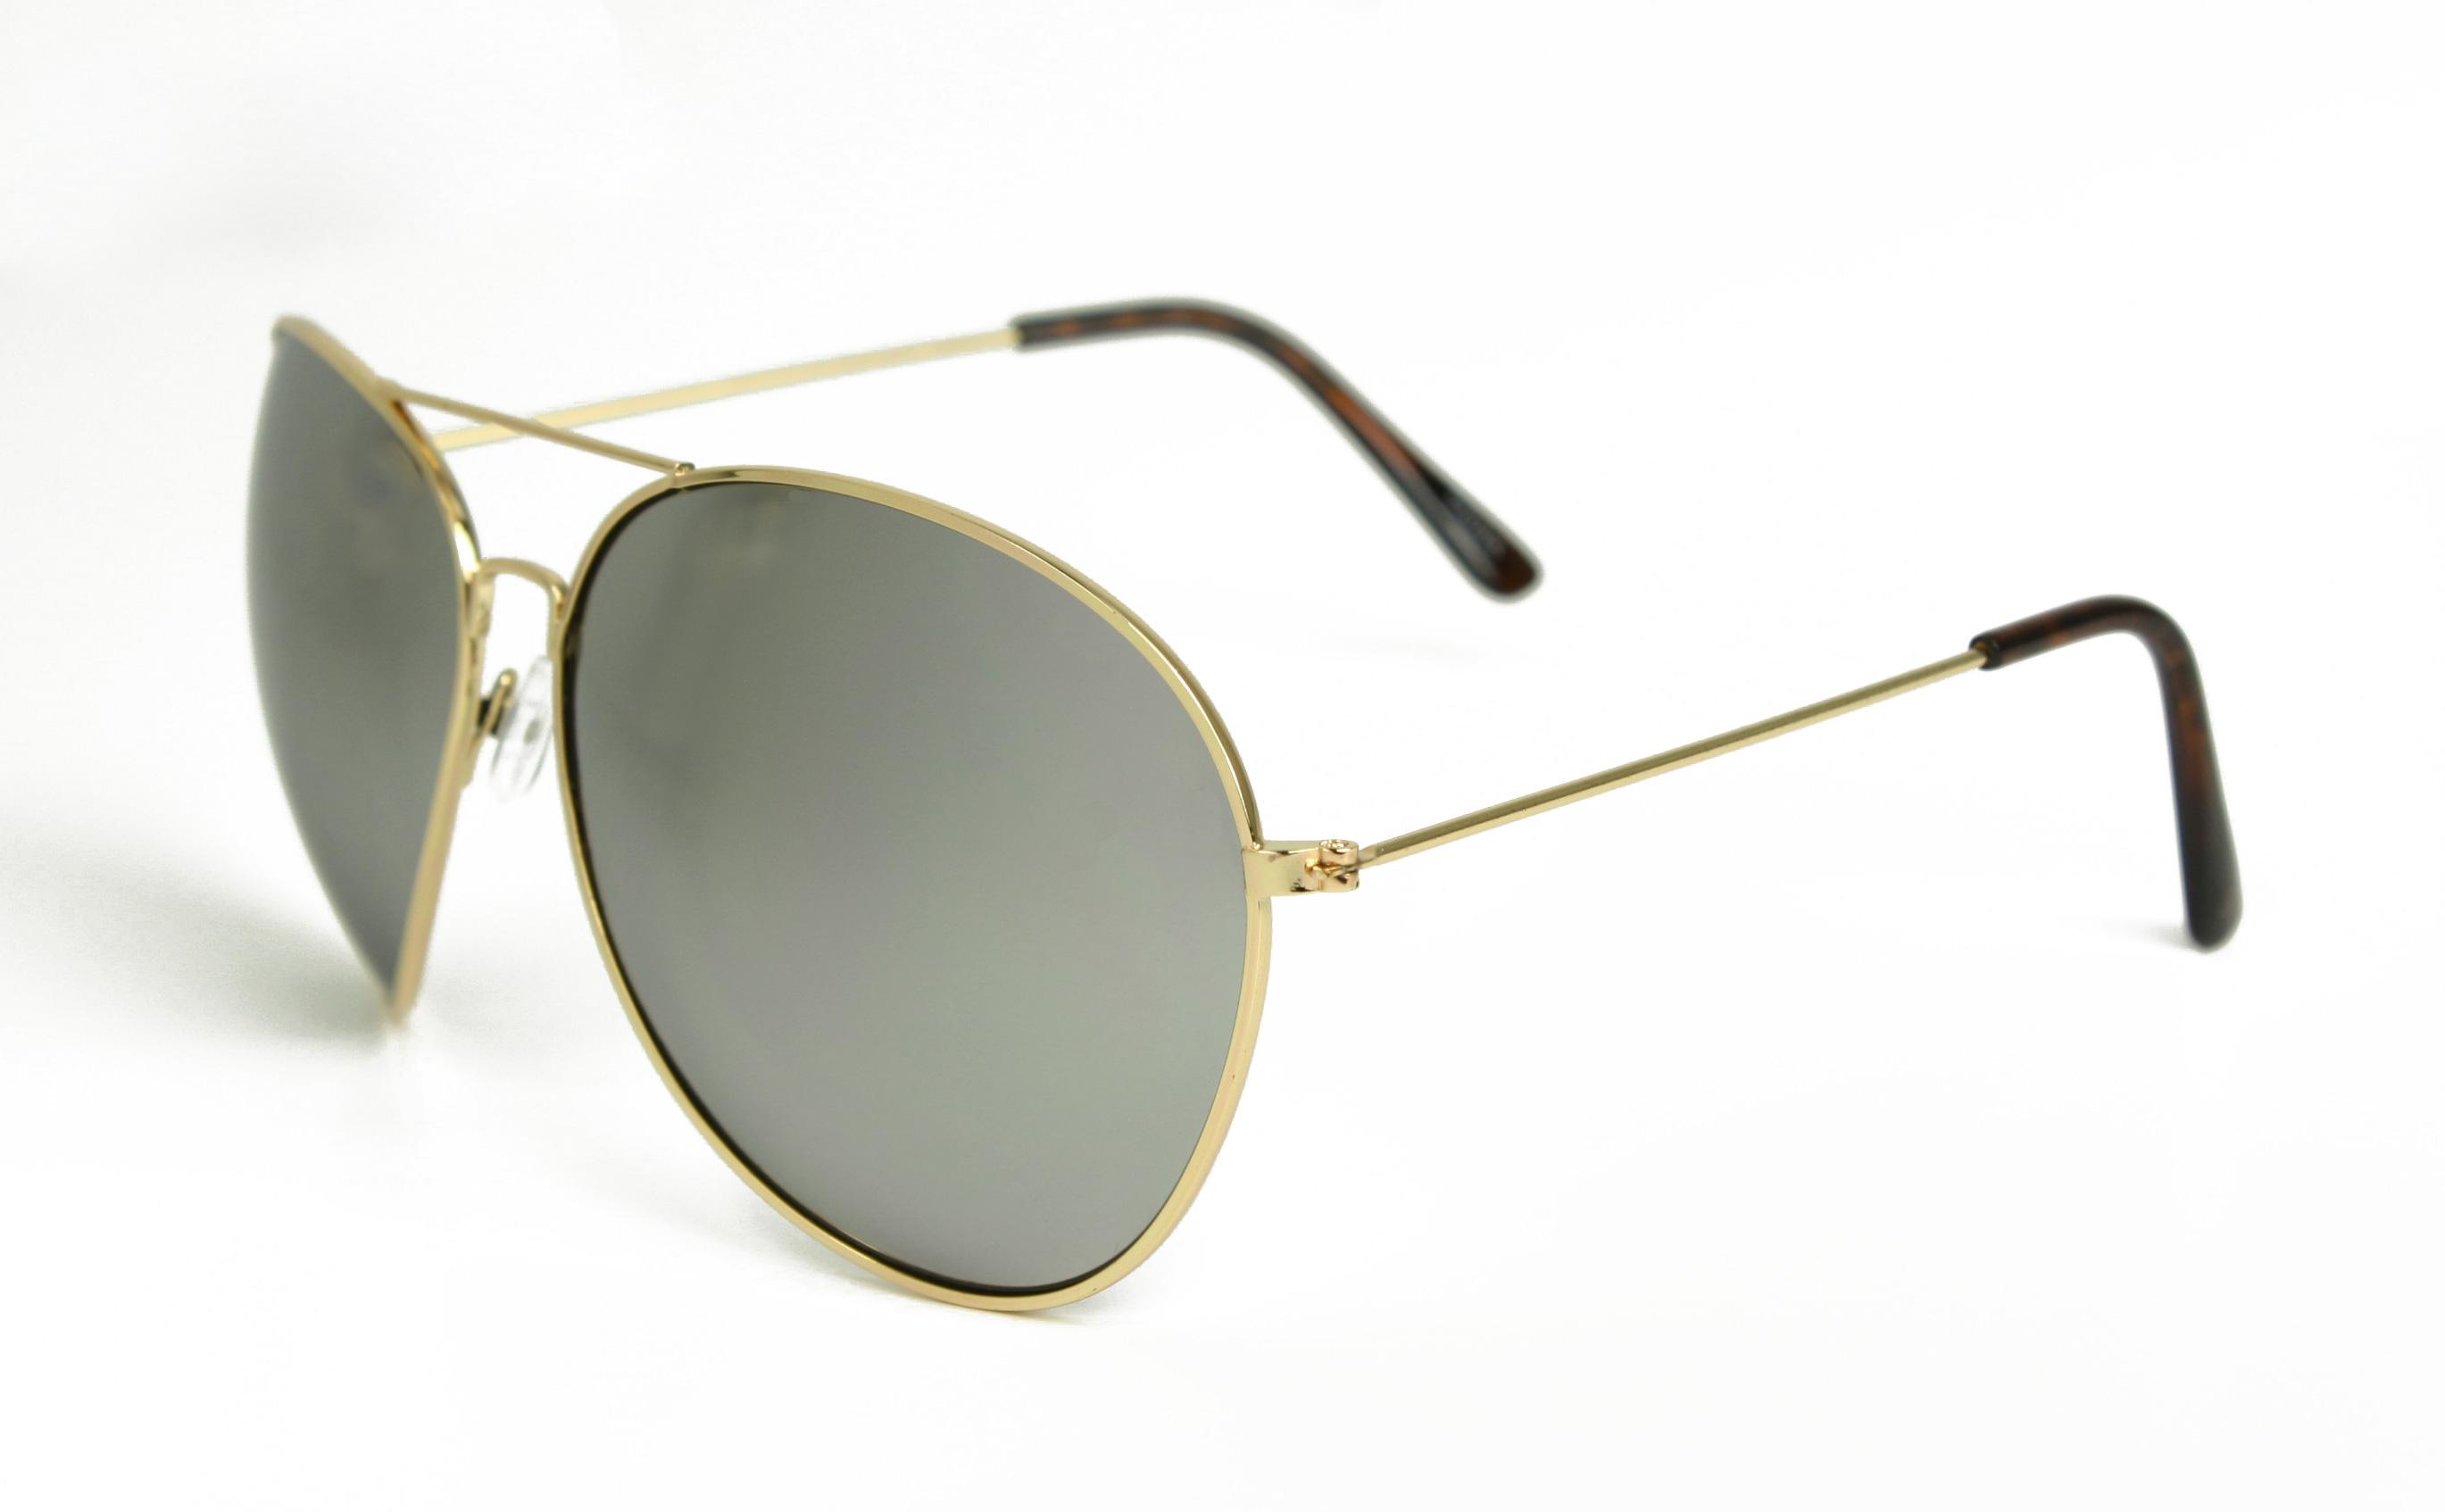 Aviator Sunglasses Gold Frame Mirror Lens : Oversized Extra Large Aviator Sunglasses Mirror Lenses ...